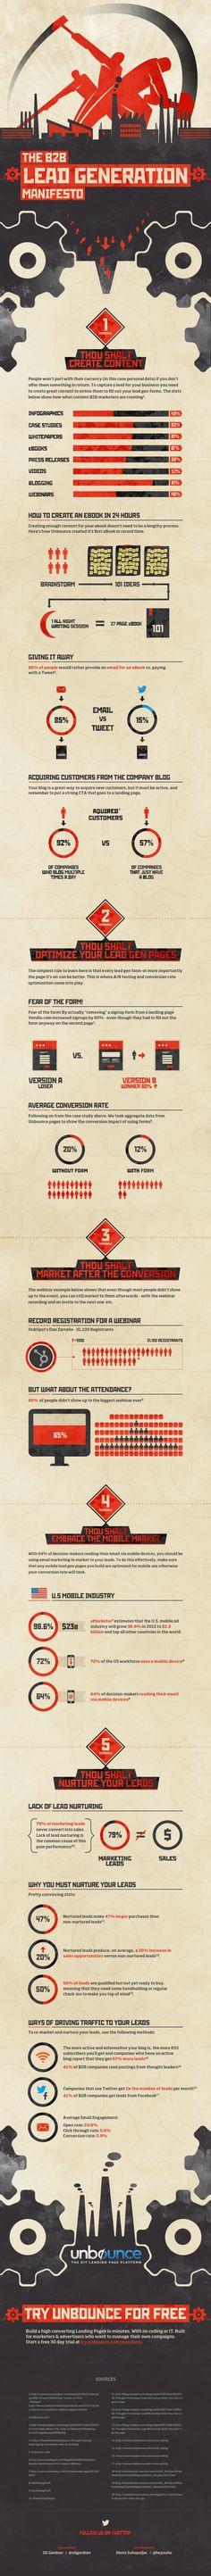 The B2B Lead Generation Manifesto #Infographic #B2B